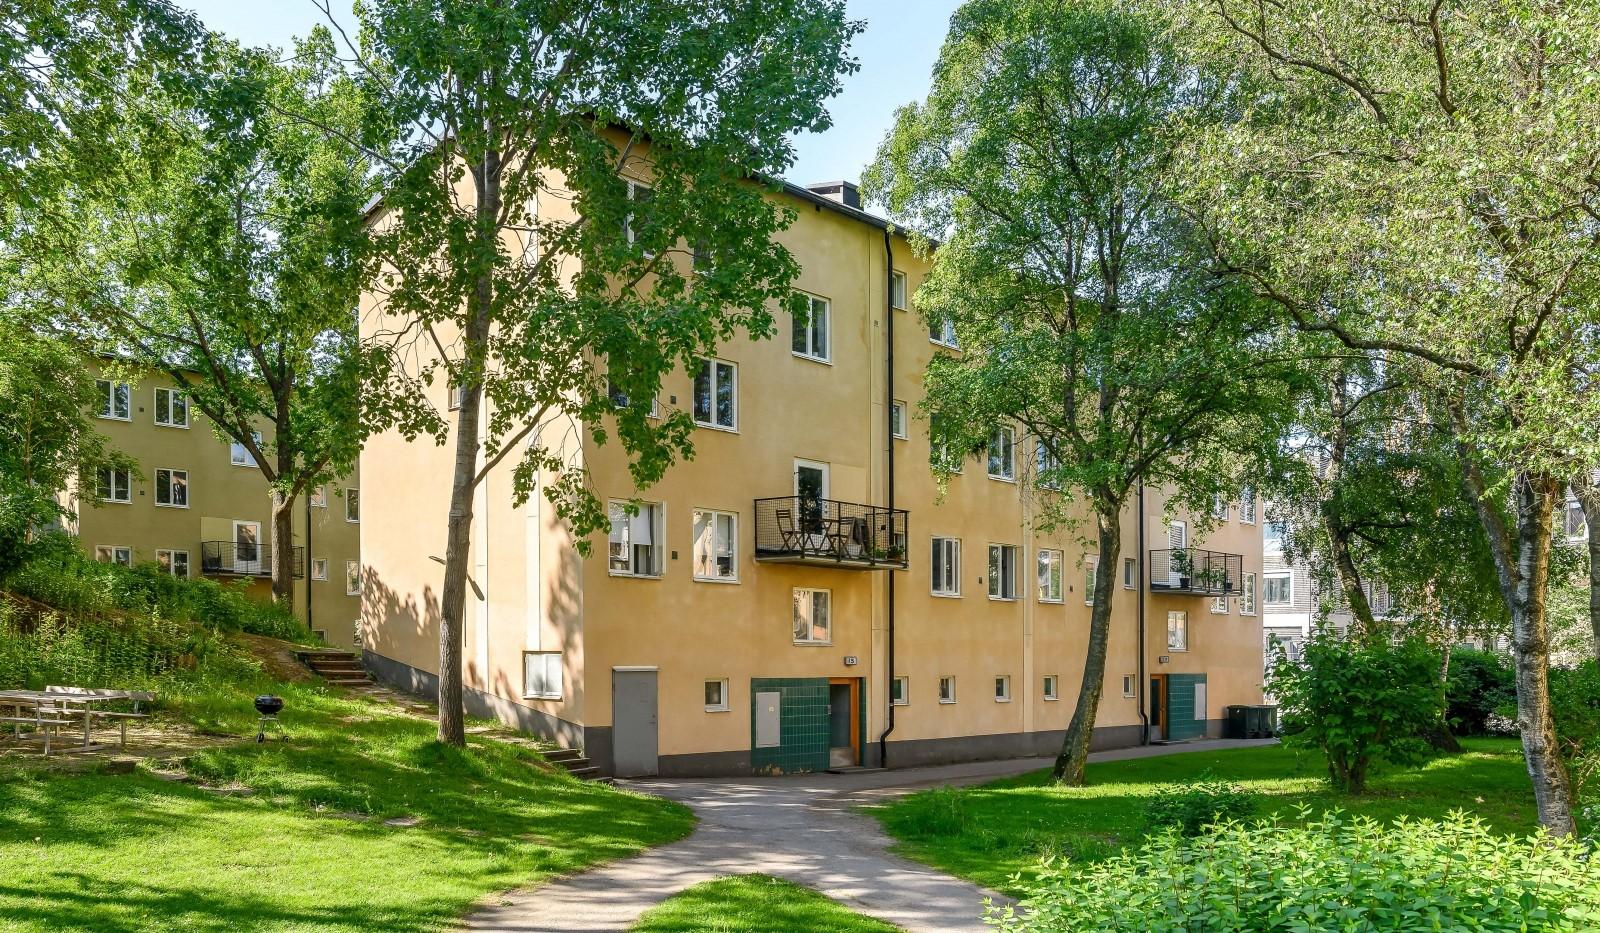 LM Ericssons väg 15, 1 tr-16